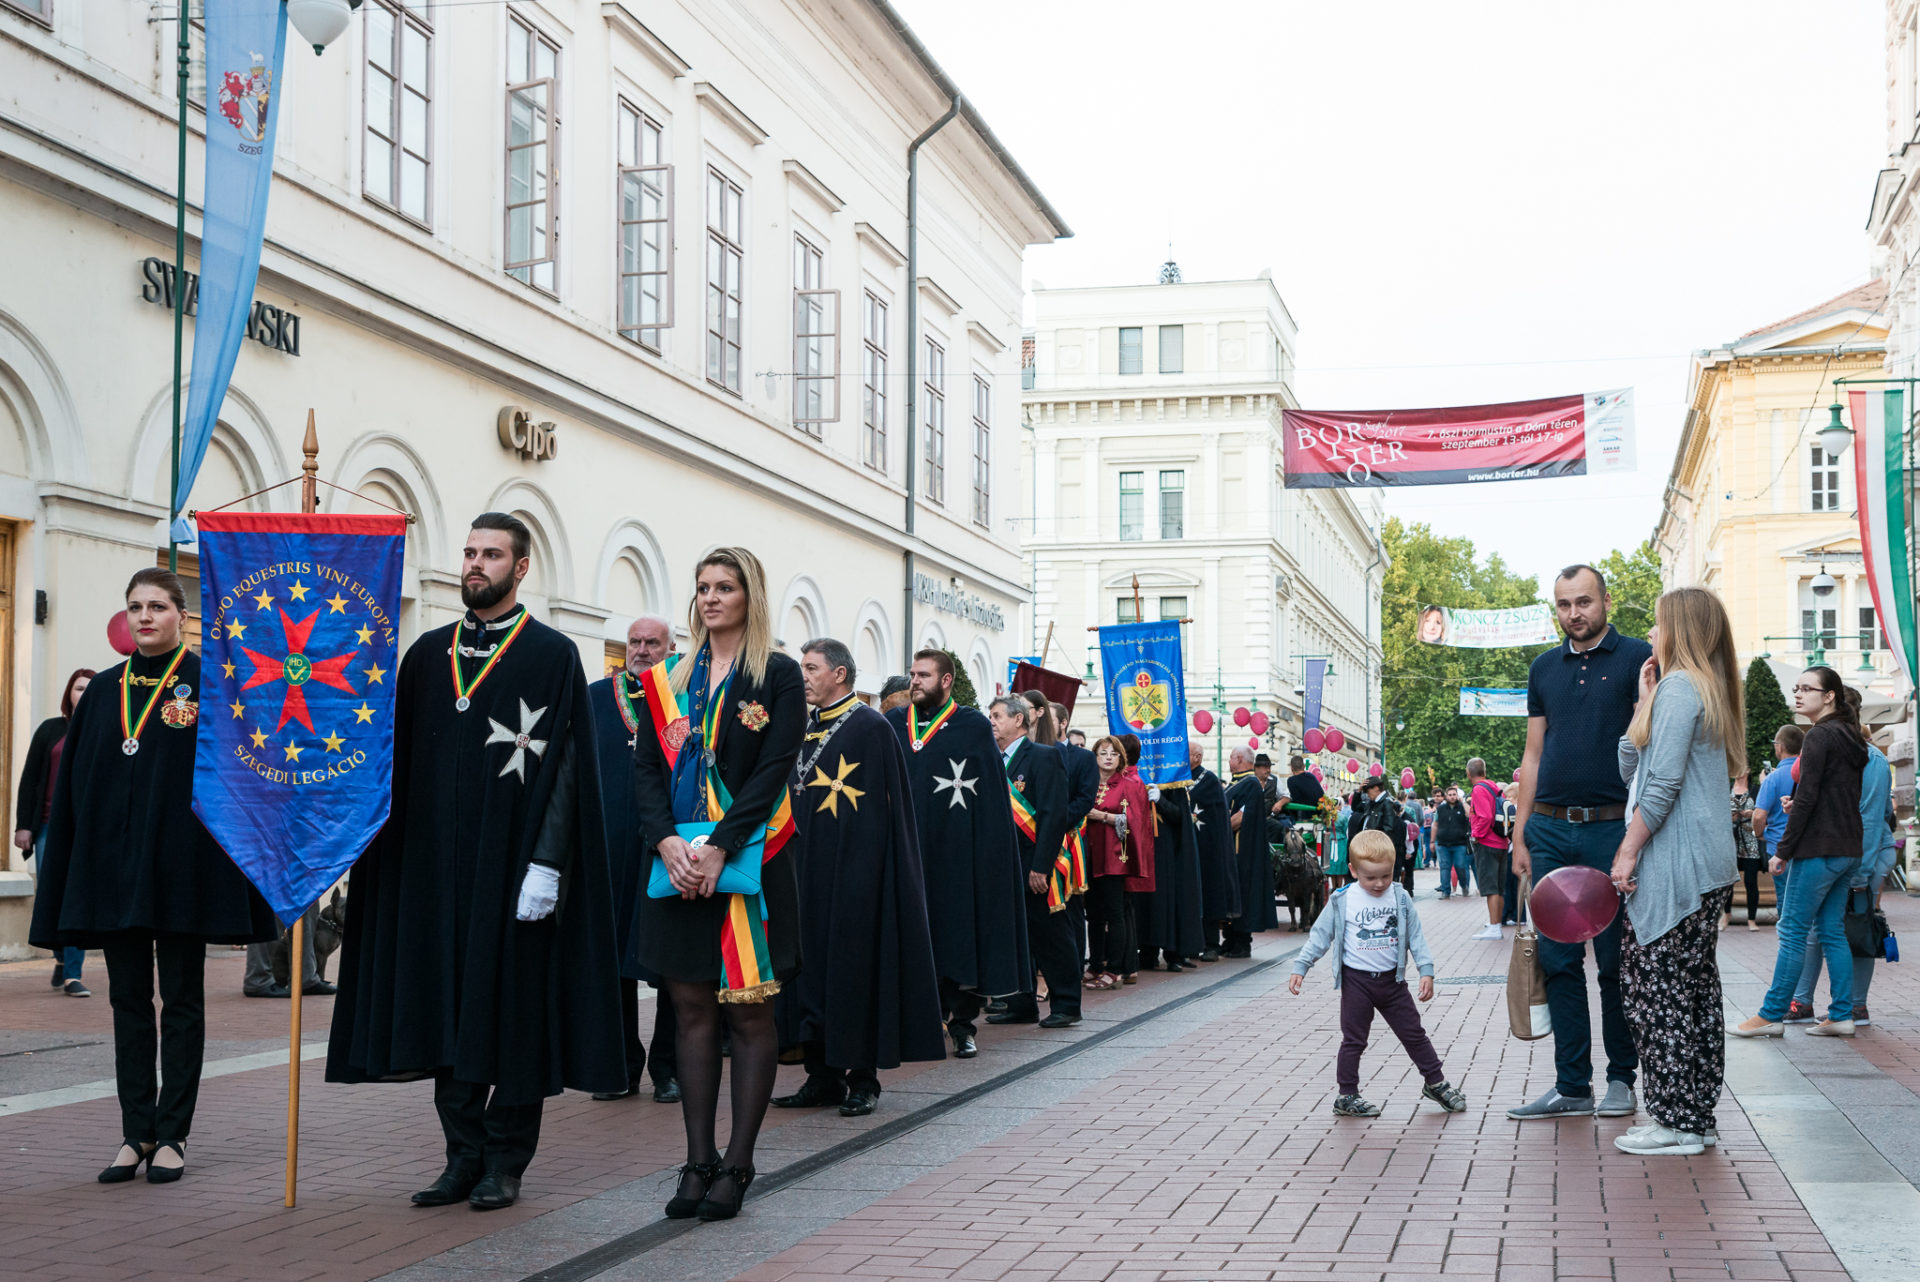 Szüreti felvonulással indult a Bortér 2017